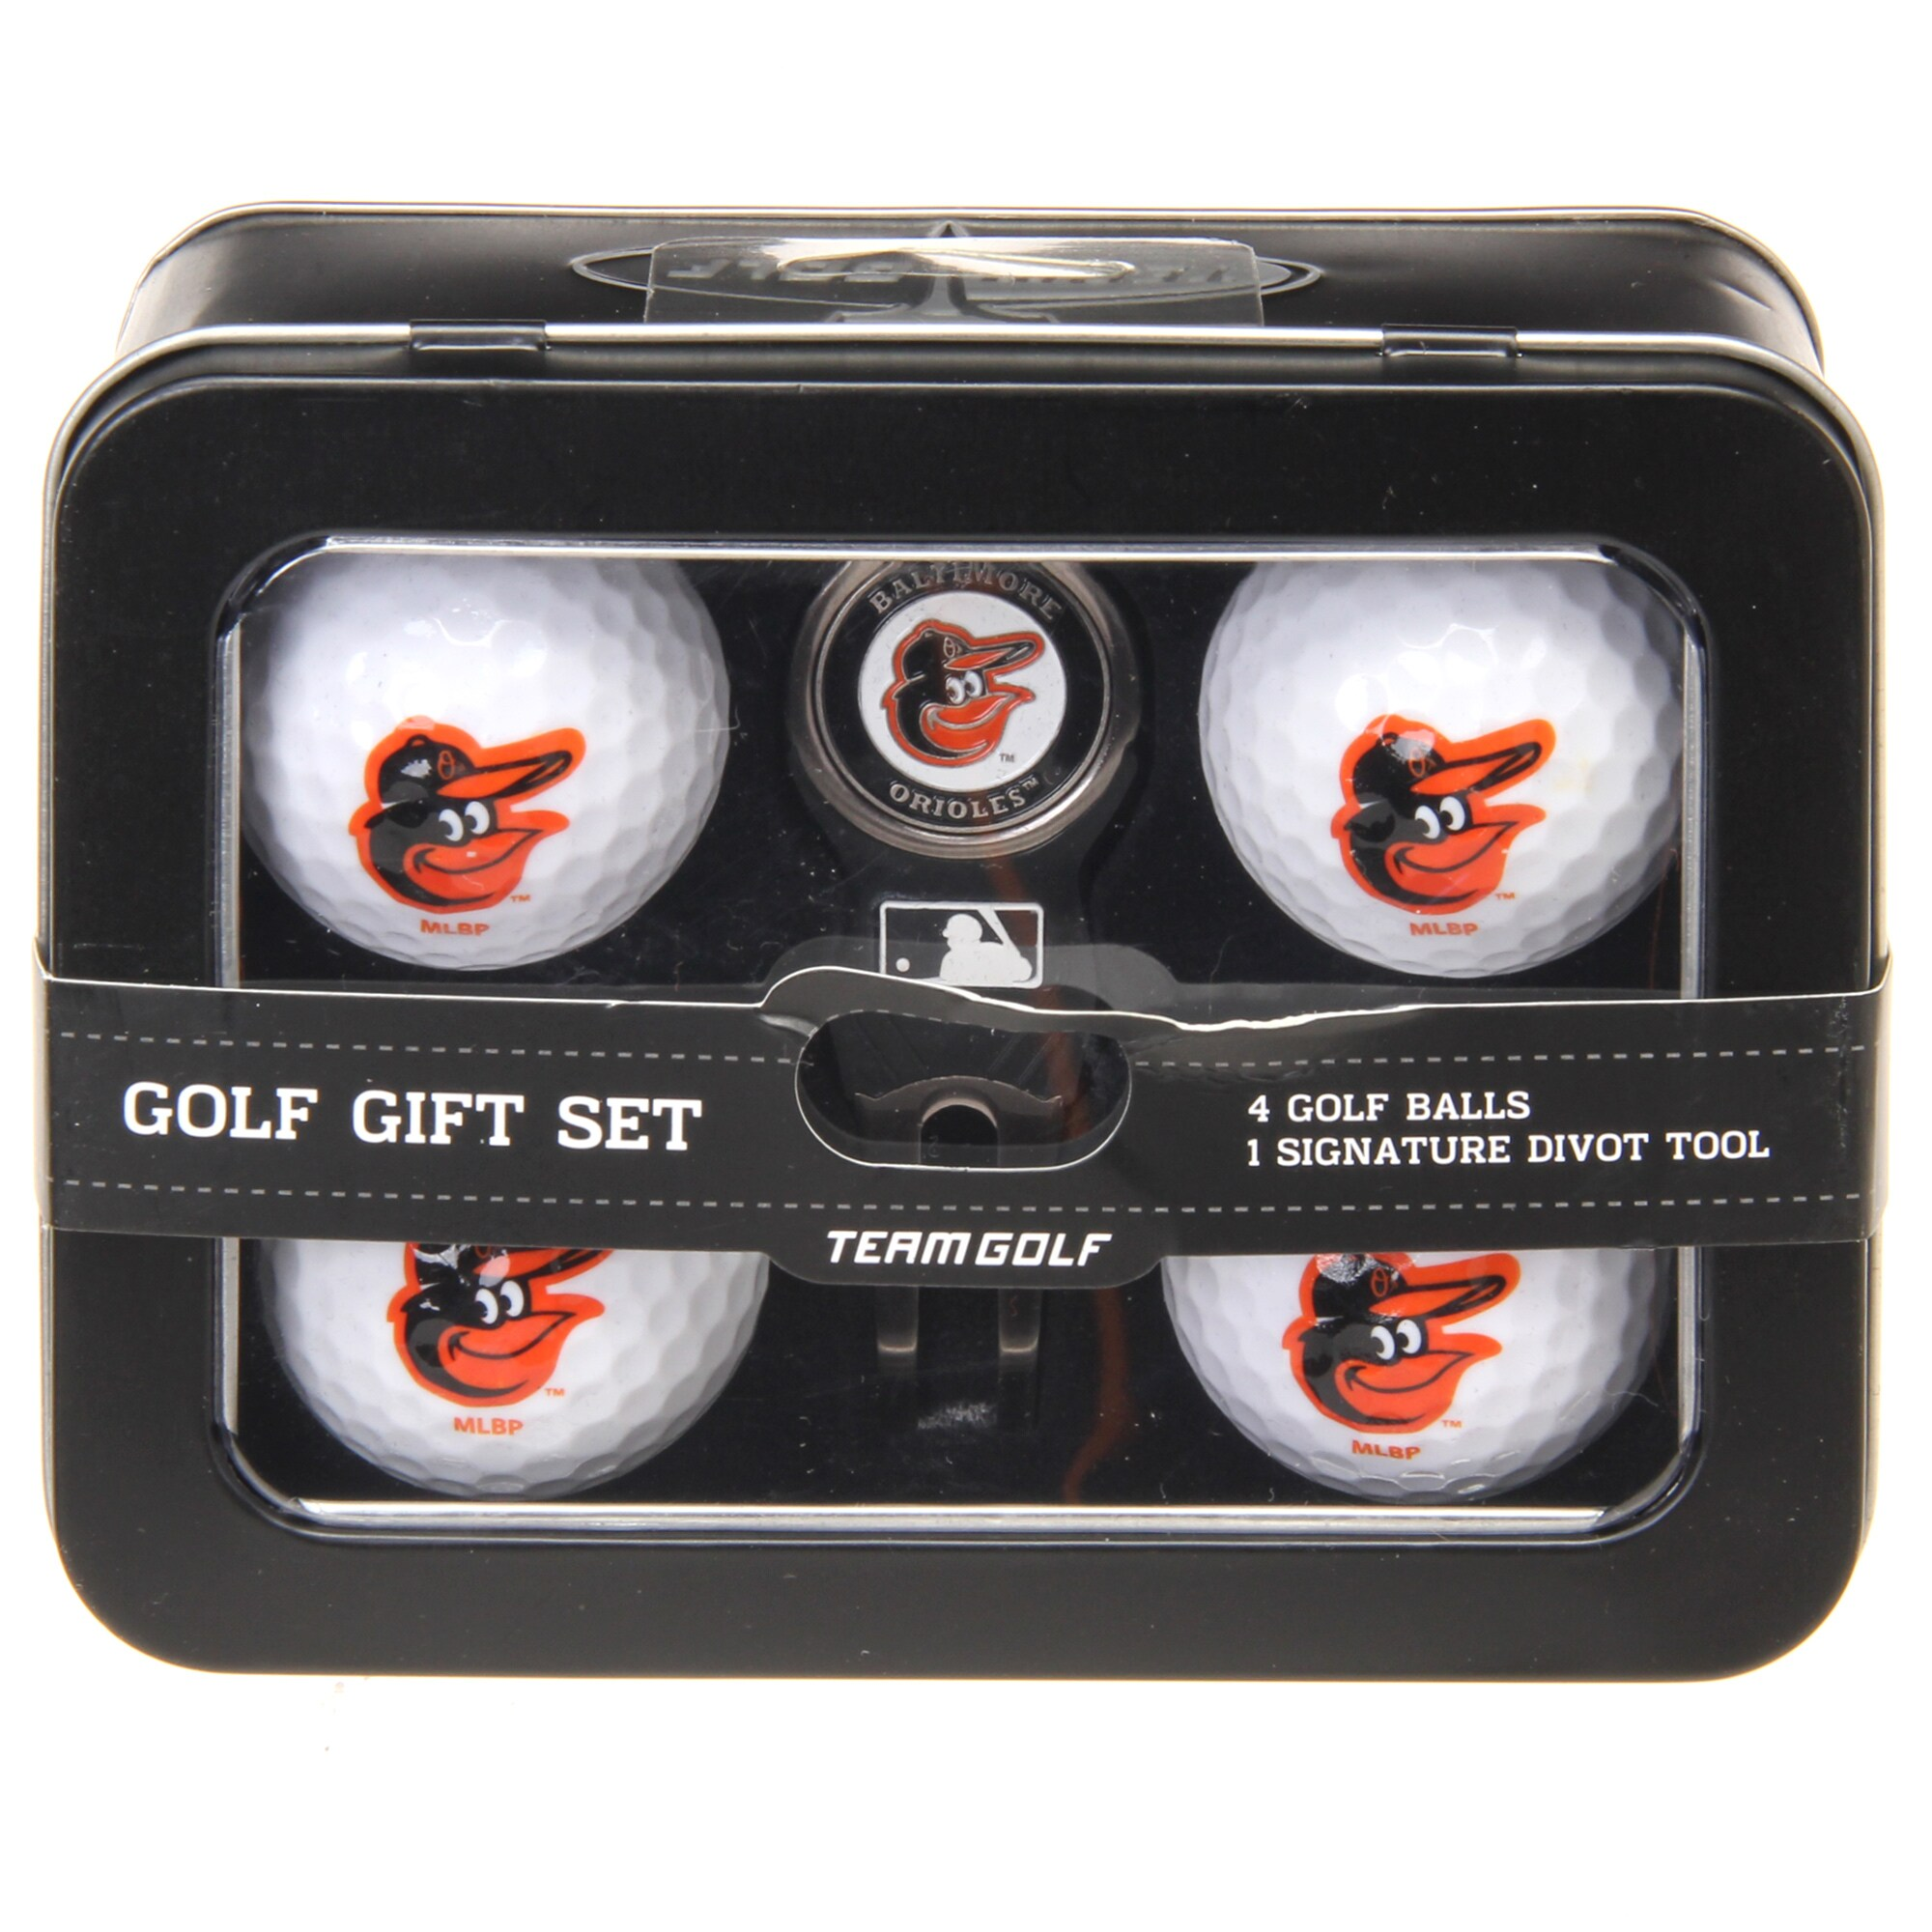 Baltimore Orioles 2016 4 Golf Ball and Divot Tool Set